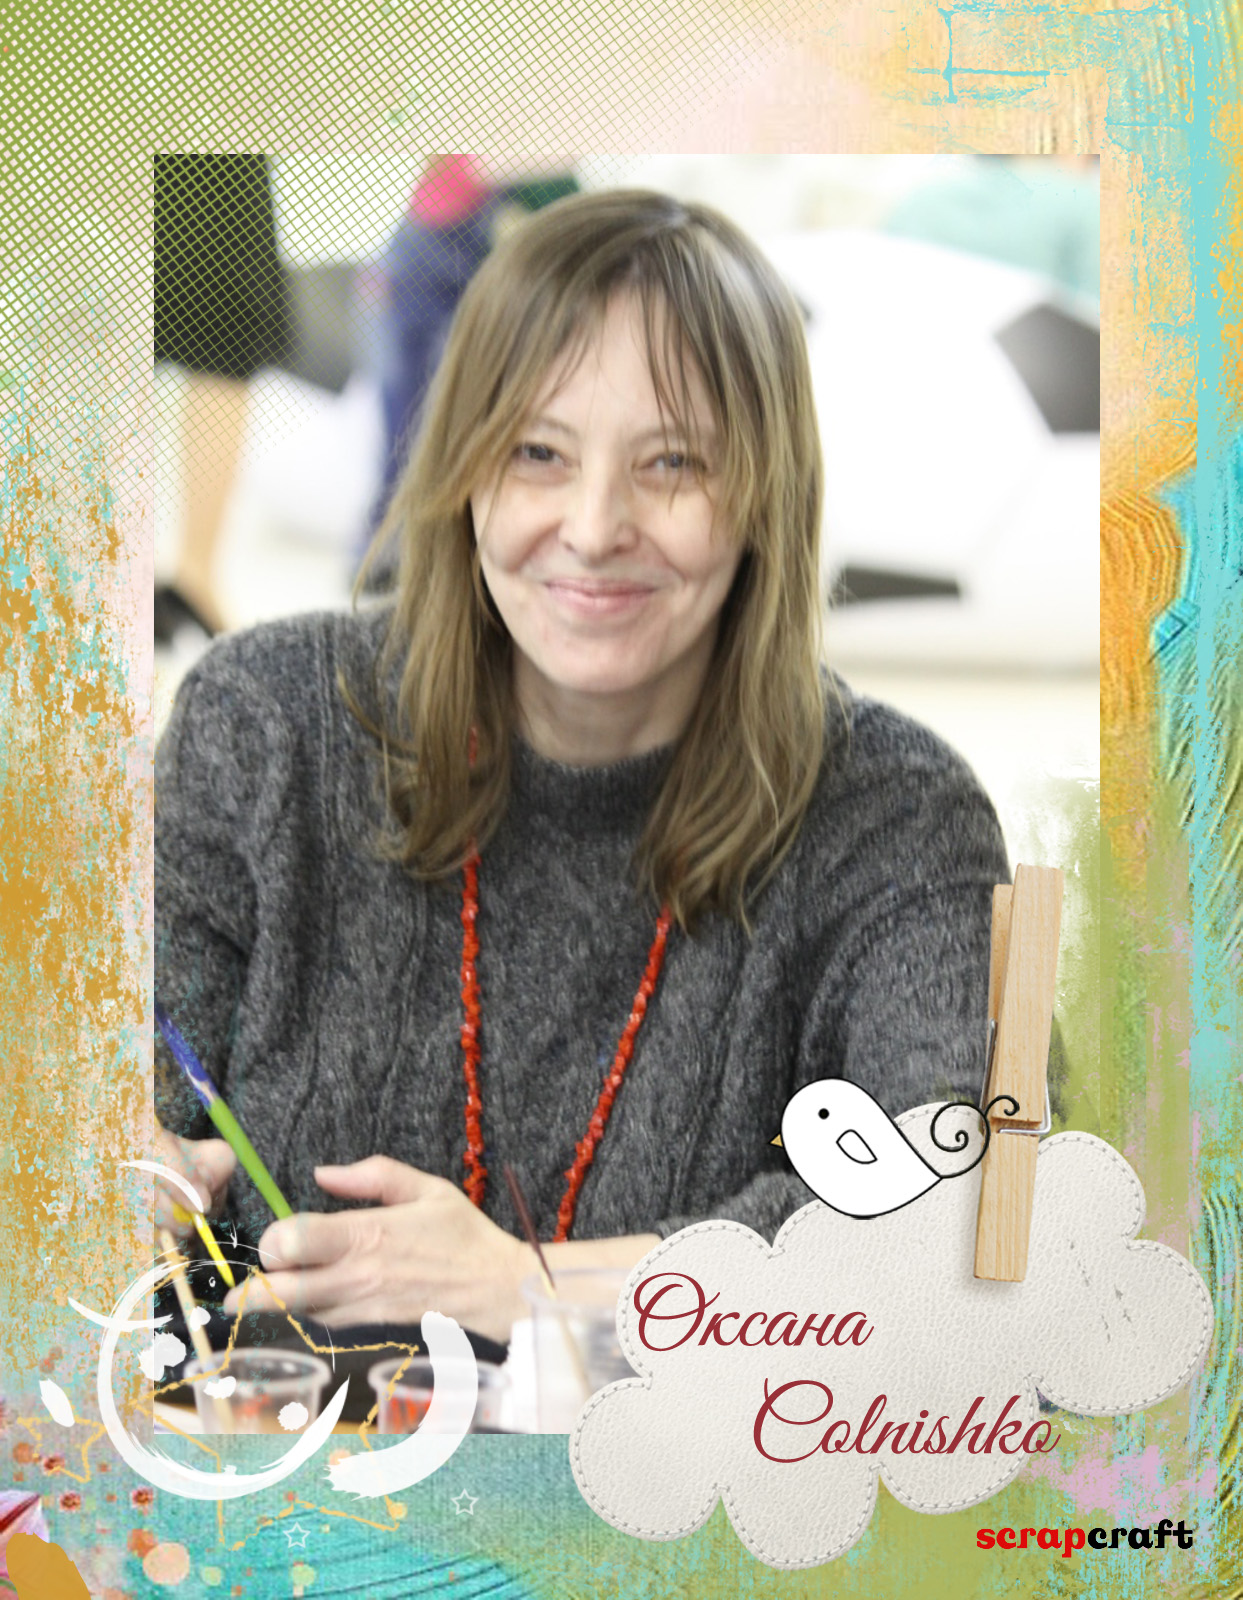 Оксана-Colnishko